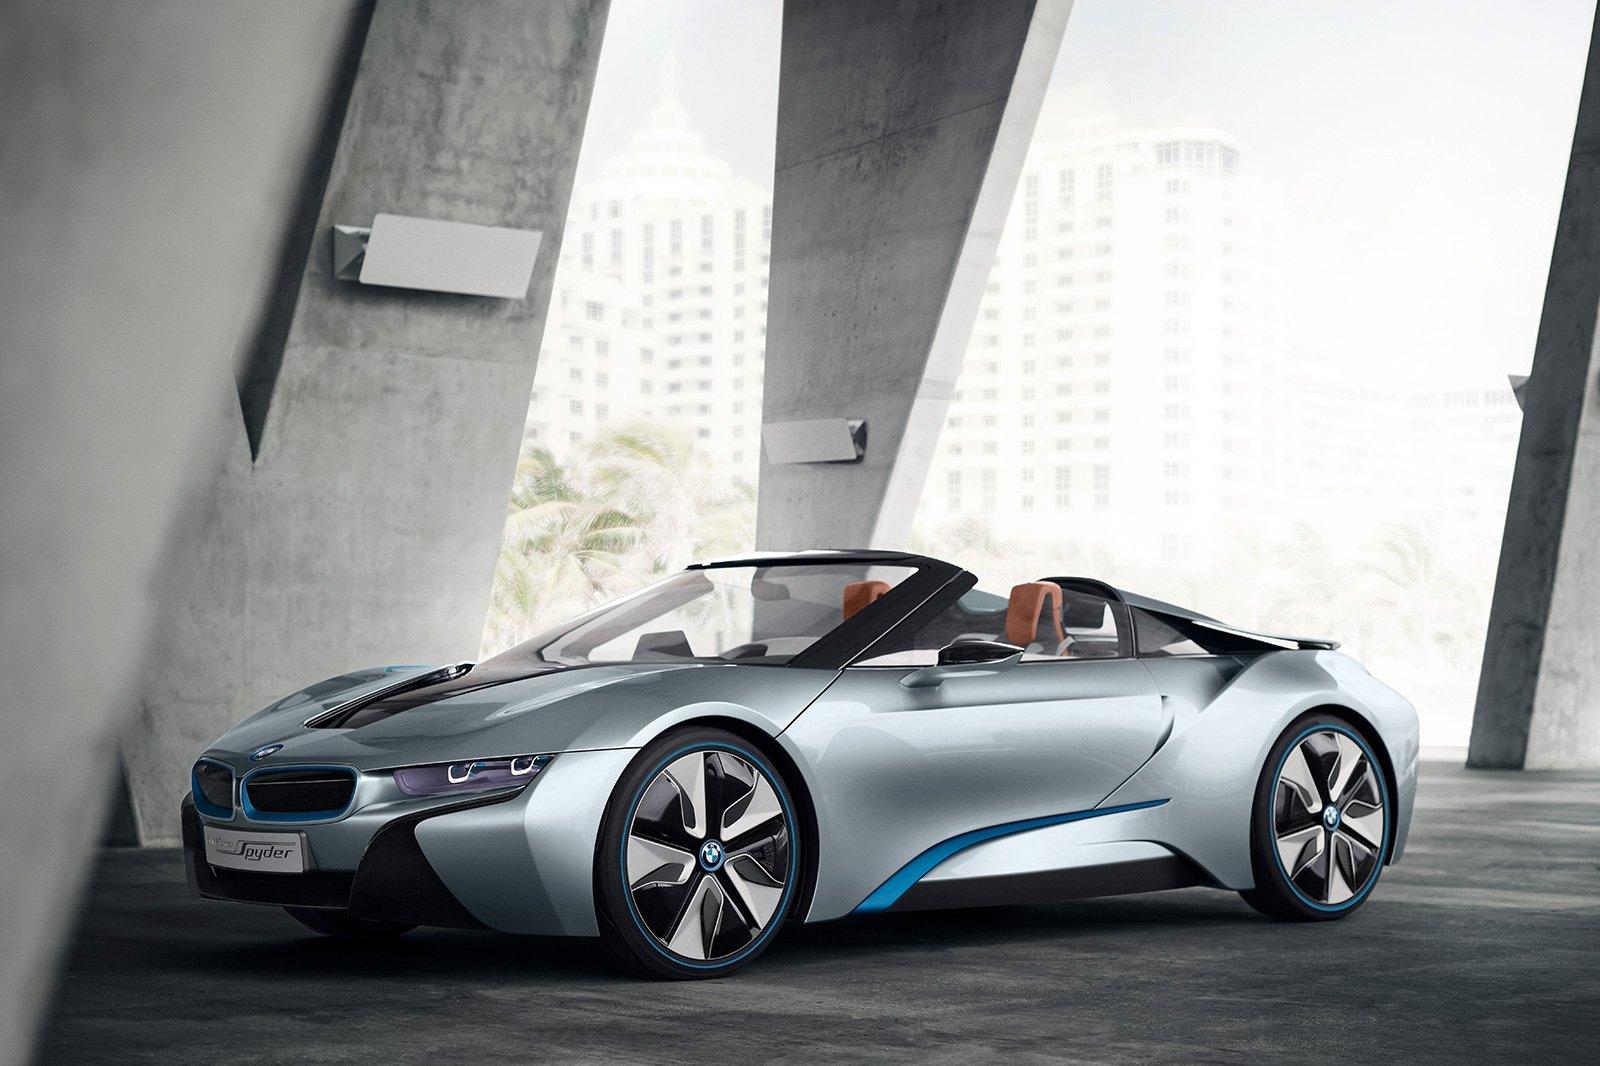 BMW i8 Spyder BMW i8 Spyder BMW i8 Spyder BMW i8 Spyder BMW i8 Spyder BMW i8 Spyder BMW i8 Spyder BMW i8 Spyder BMW i8 Spyder BMW i8 Spyder